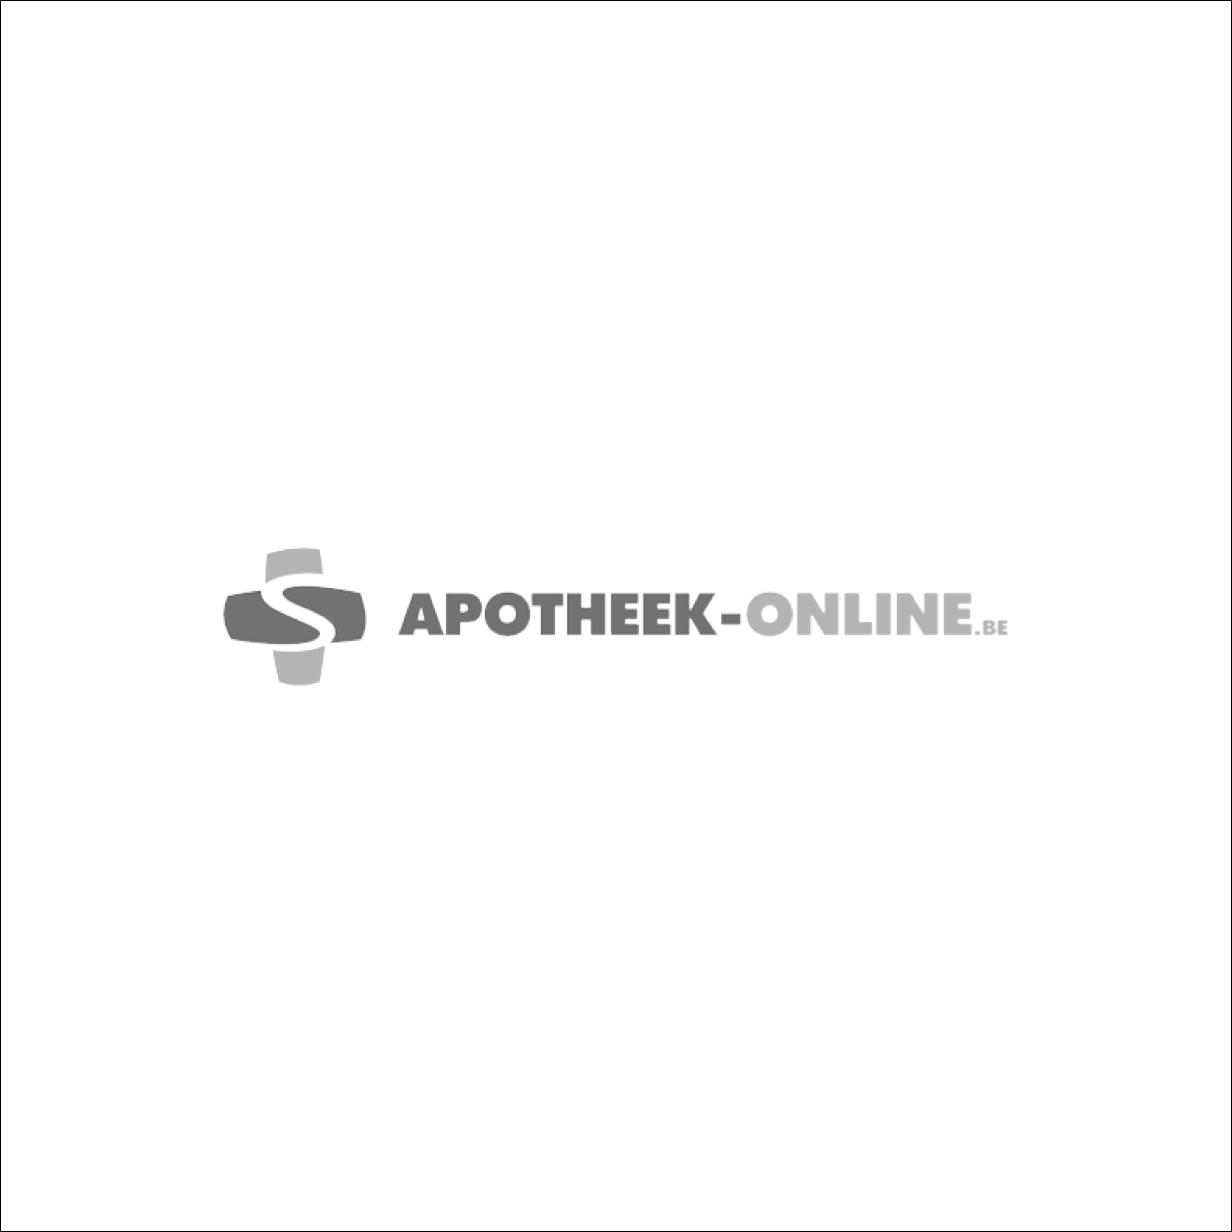 GAZIN CP N/STER 8P 10,0X10,0CM 100 18506